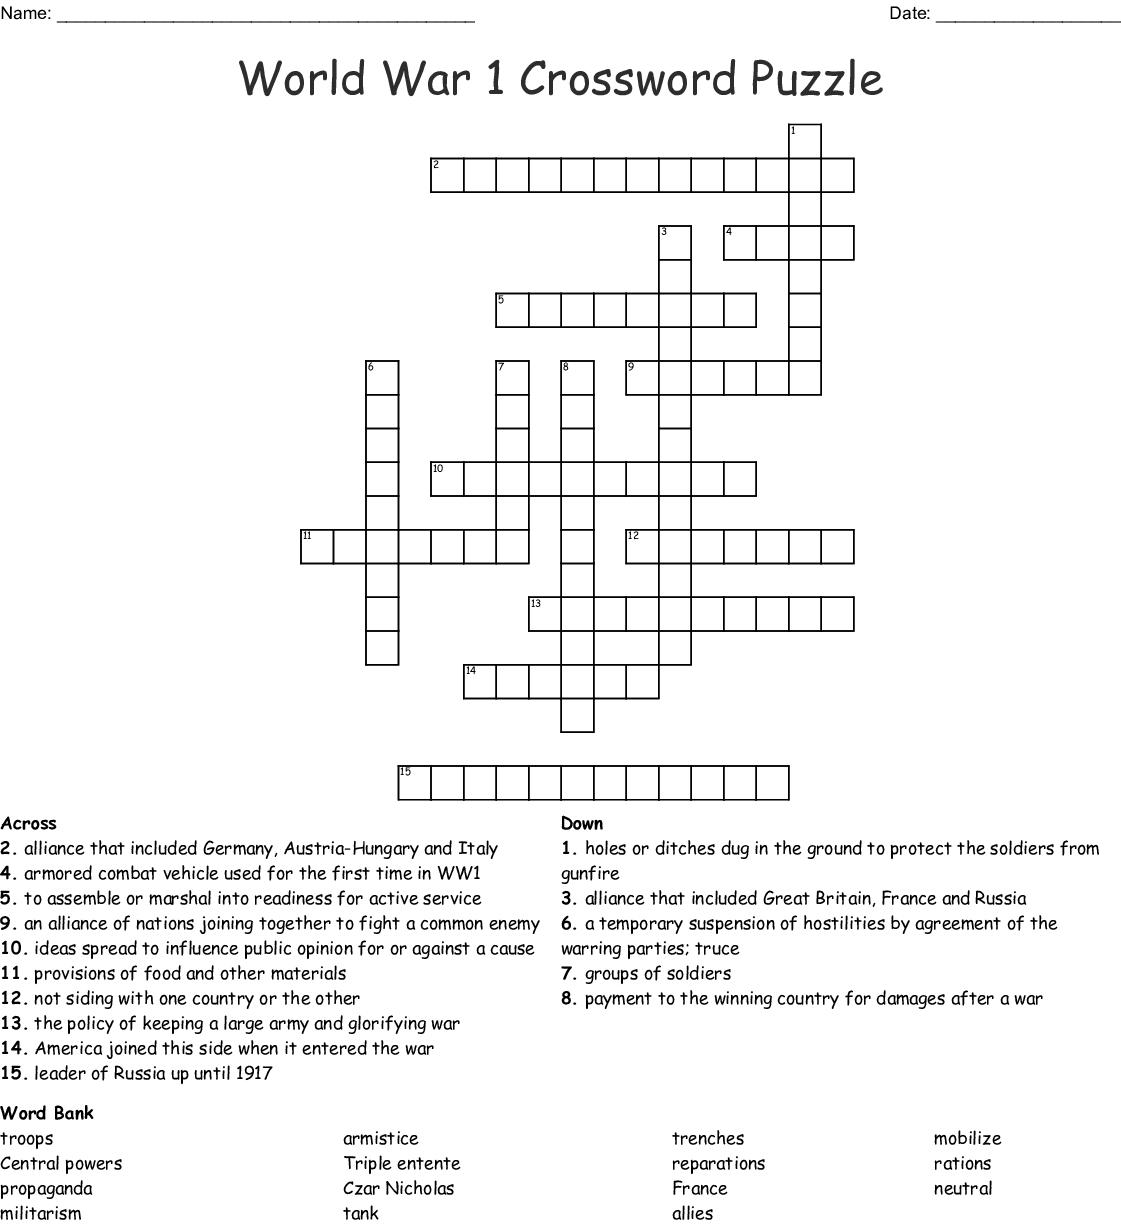 World War 1 Crossword